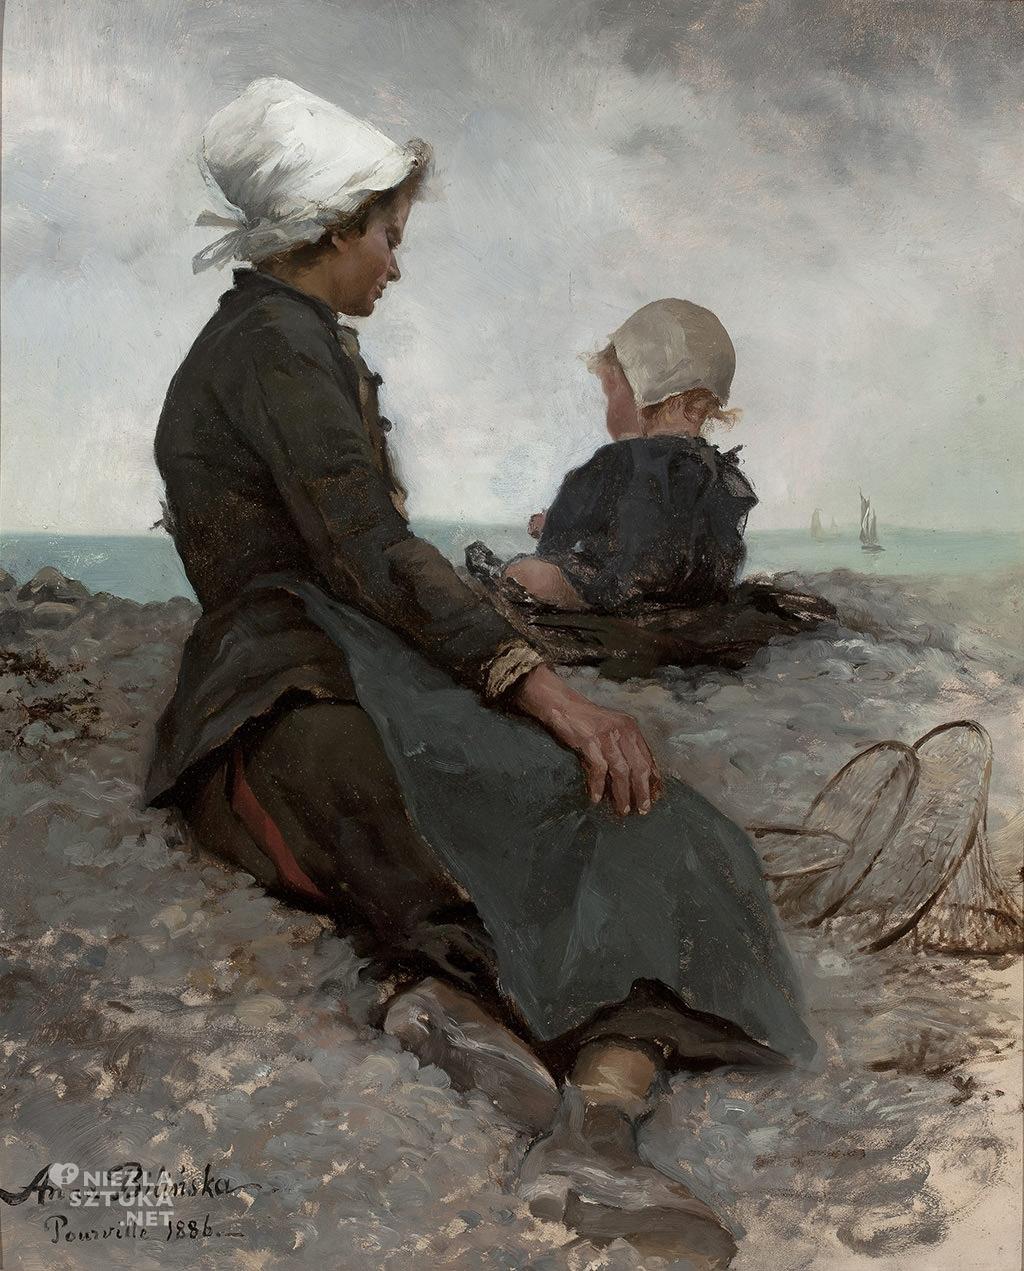 Anna Bilińska, Nad brzegiem morza